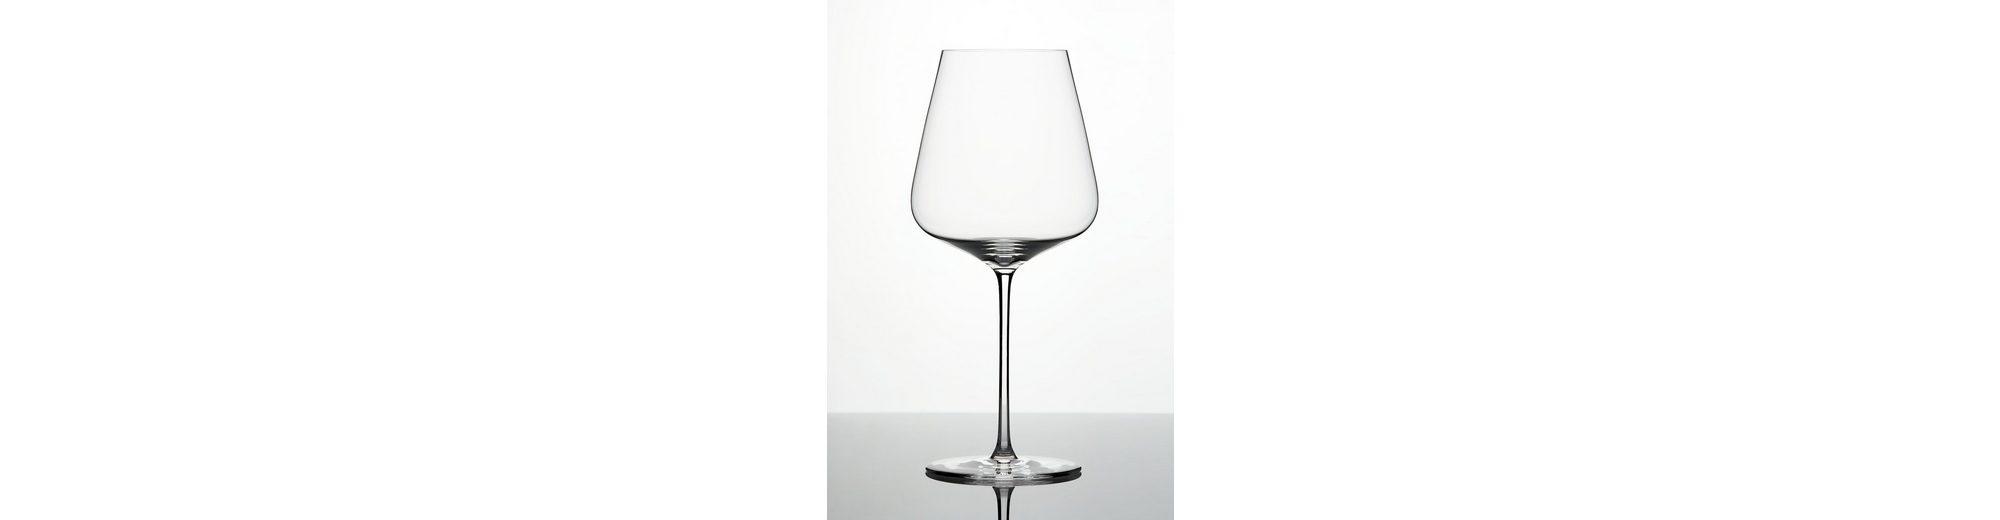 Zalto Denk Art Bordeaux-Glas